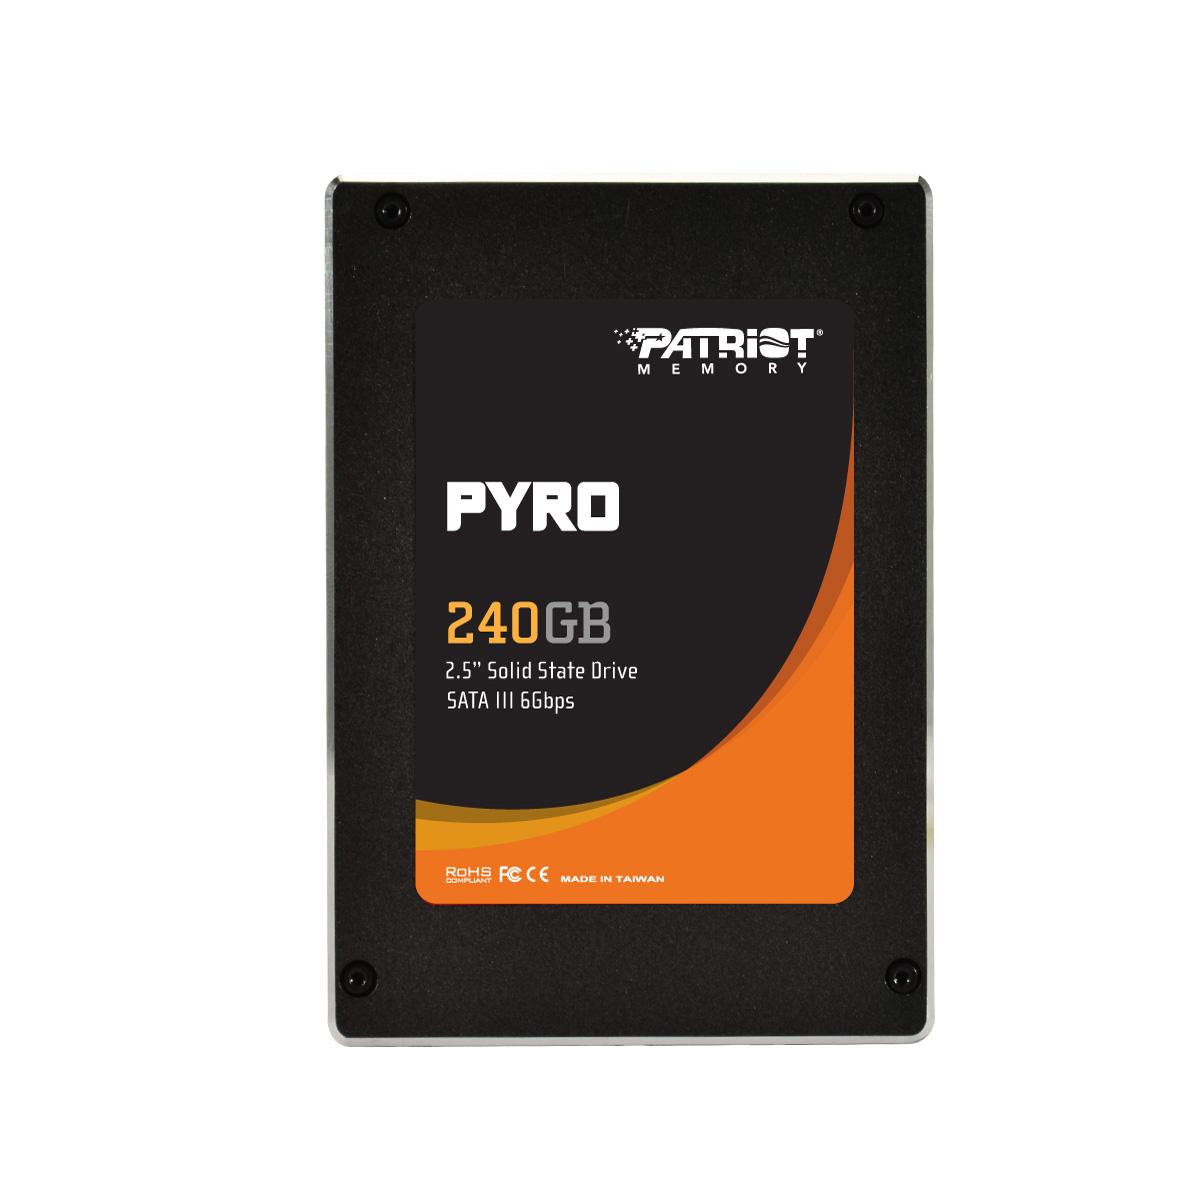 PYRO_240GB_Front